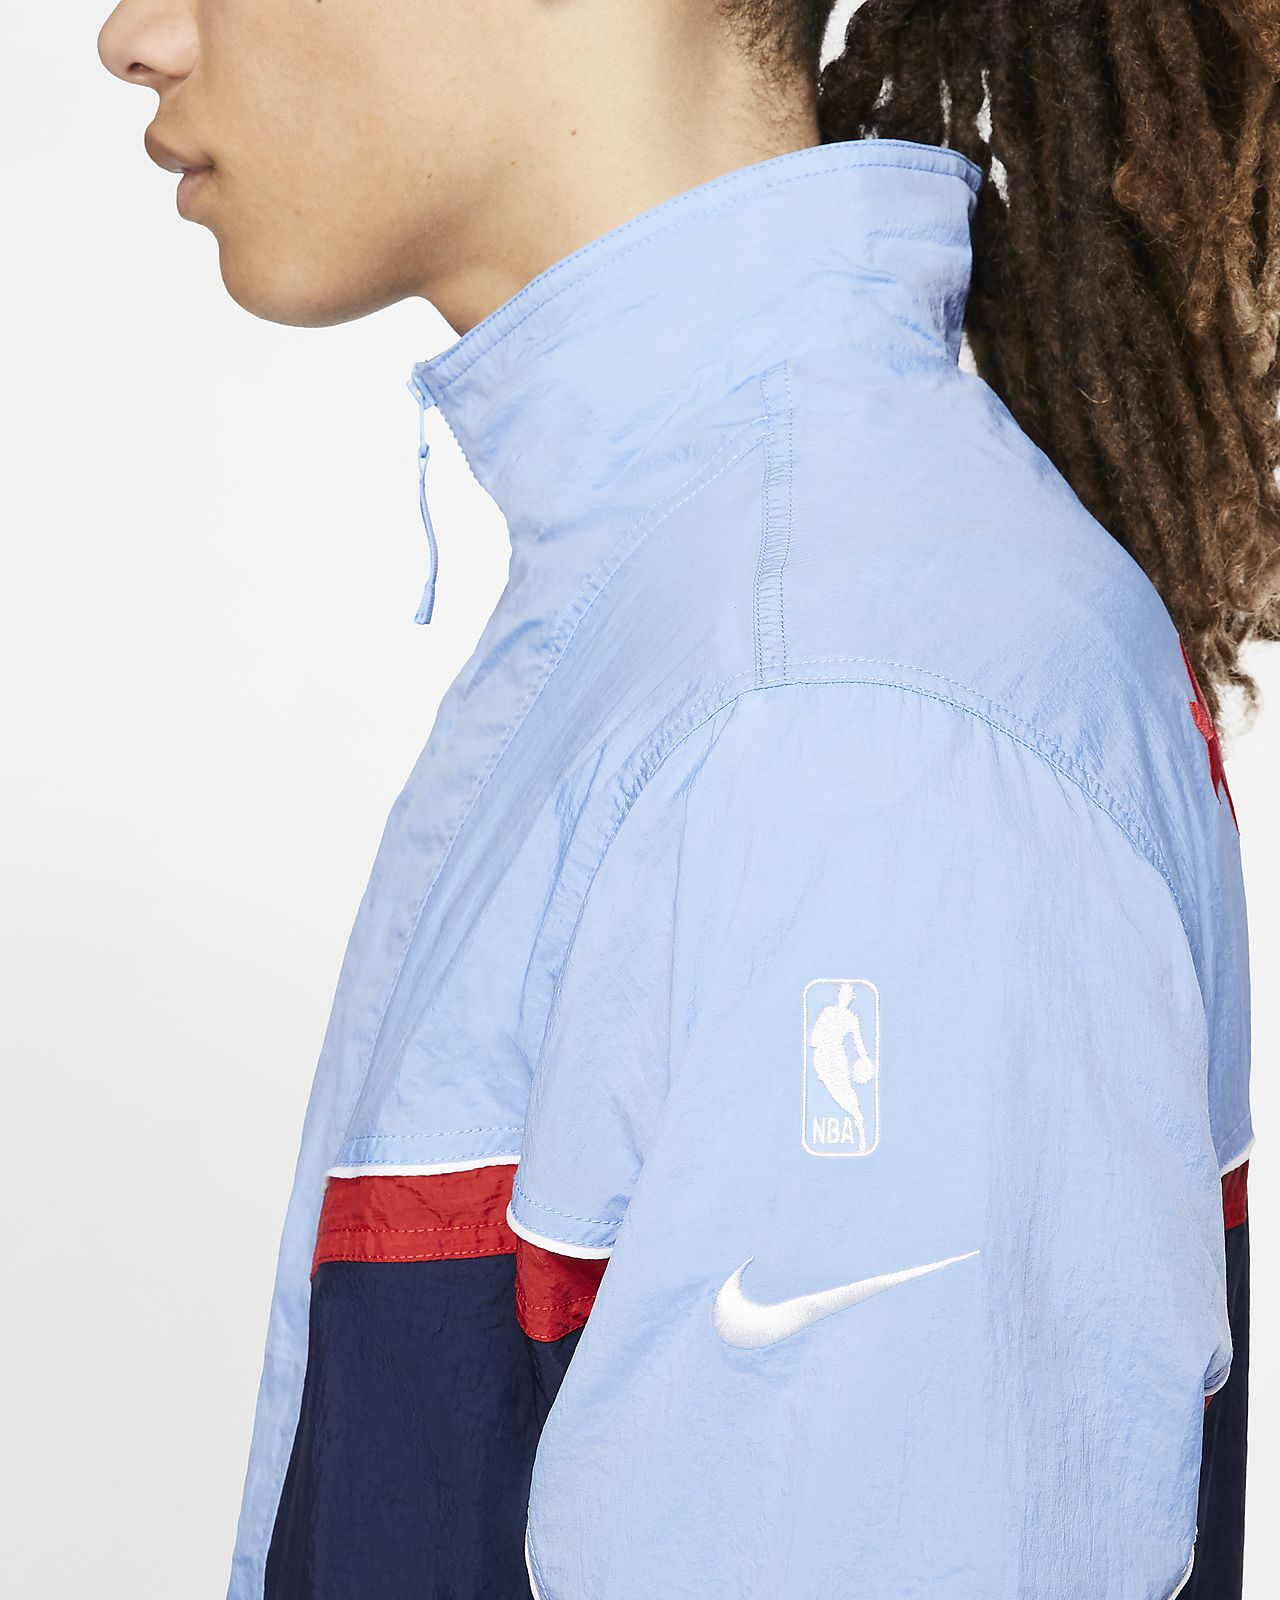 Bulls Courtside City Edition Nike NBA Trainingsanzug für Herren